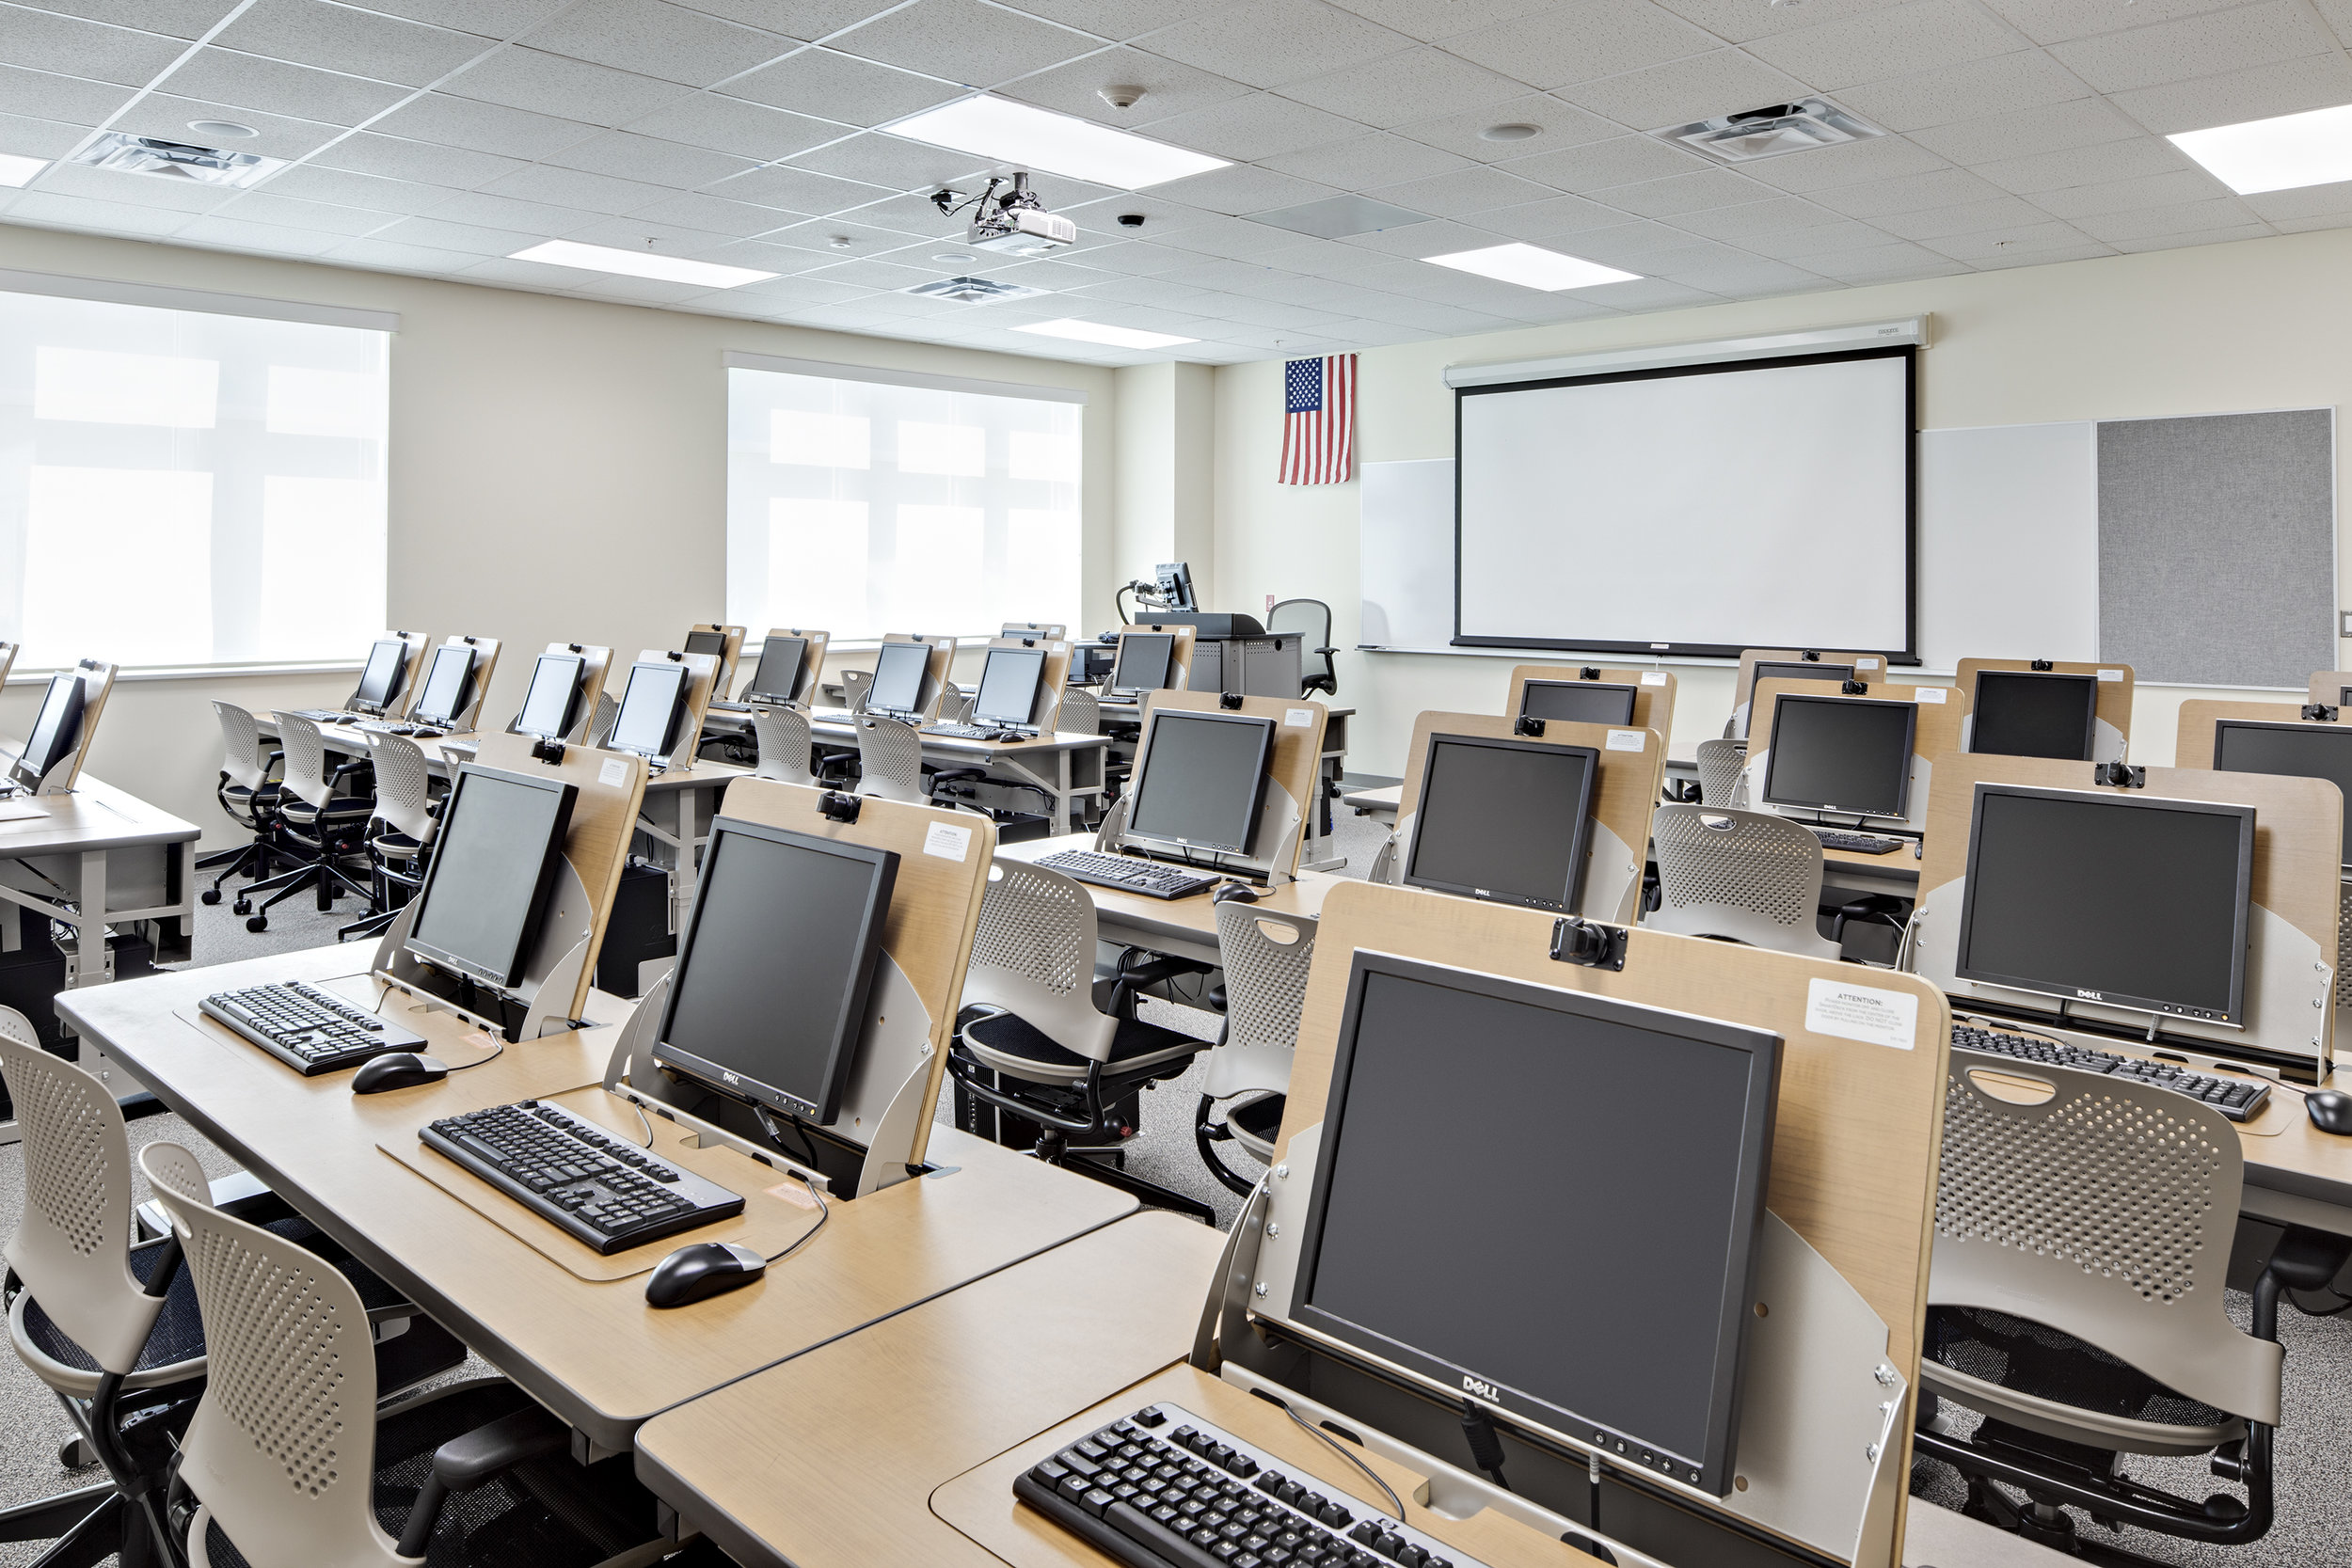 interior classroom 2.jpg